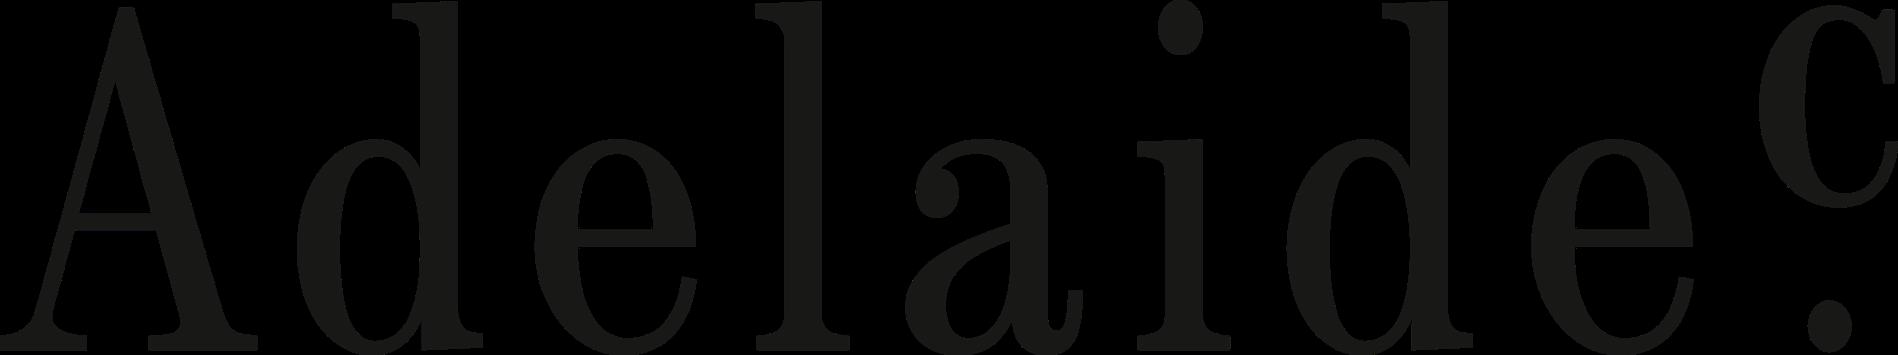 Adelaide Carta